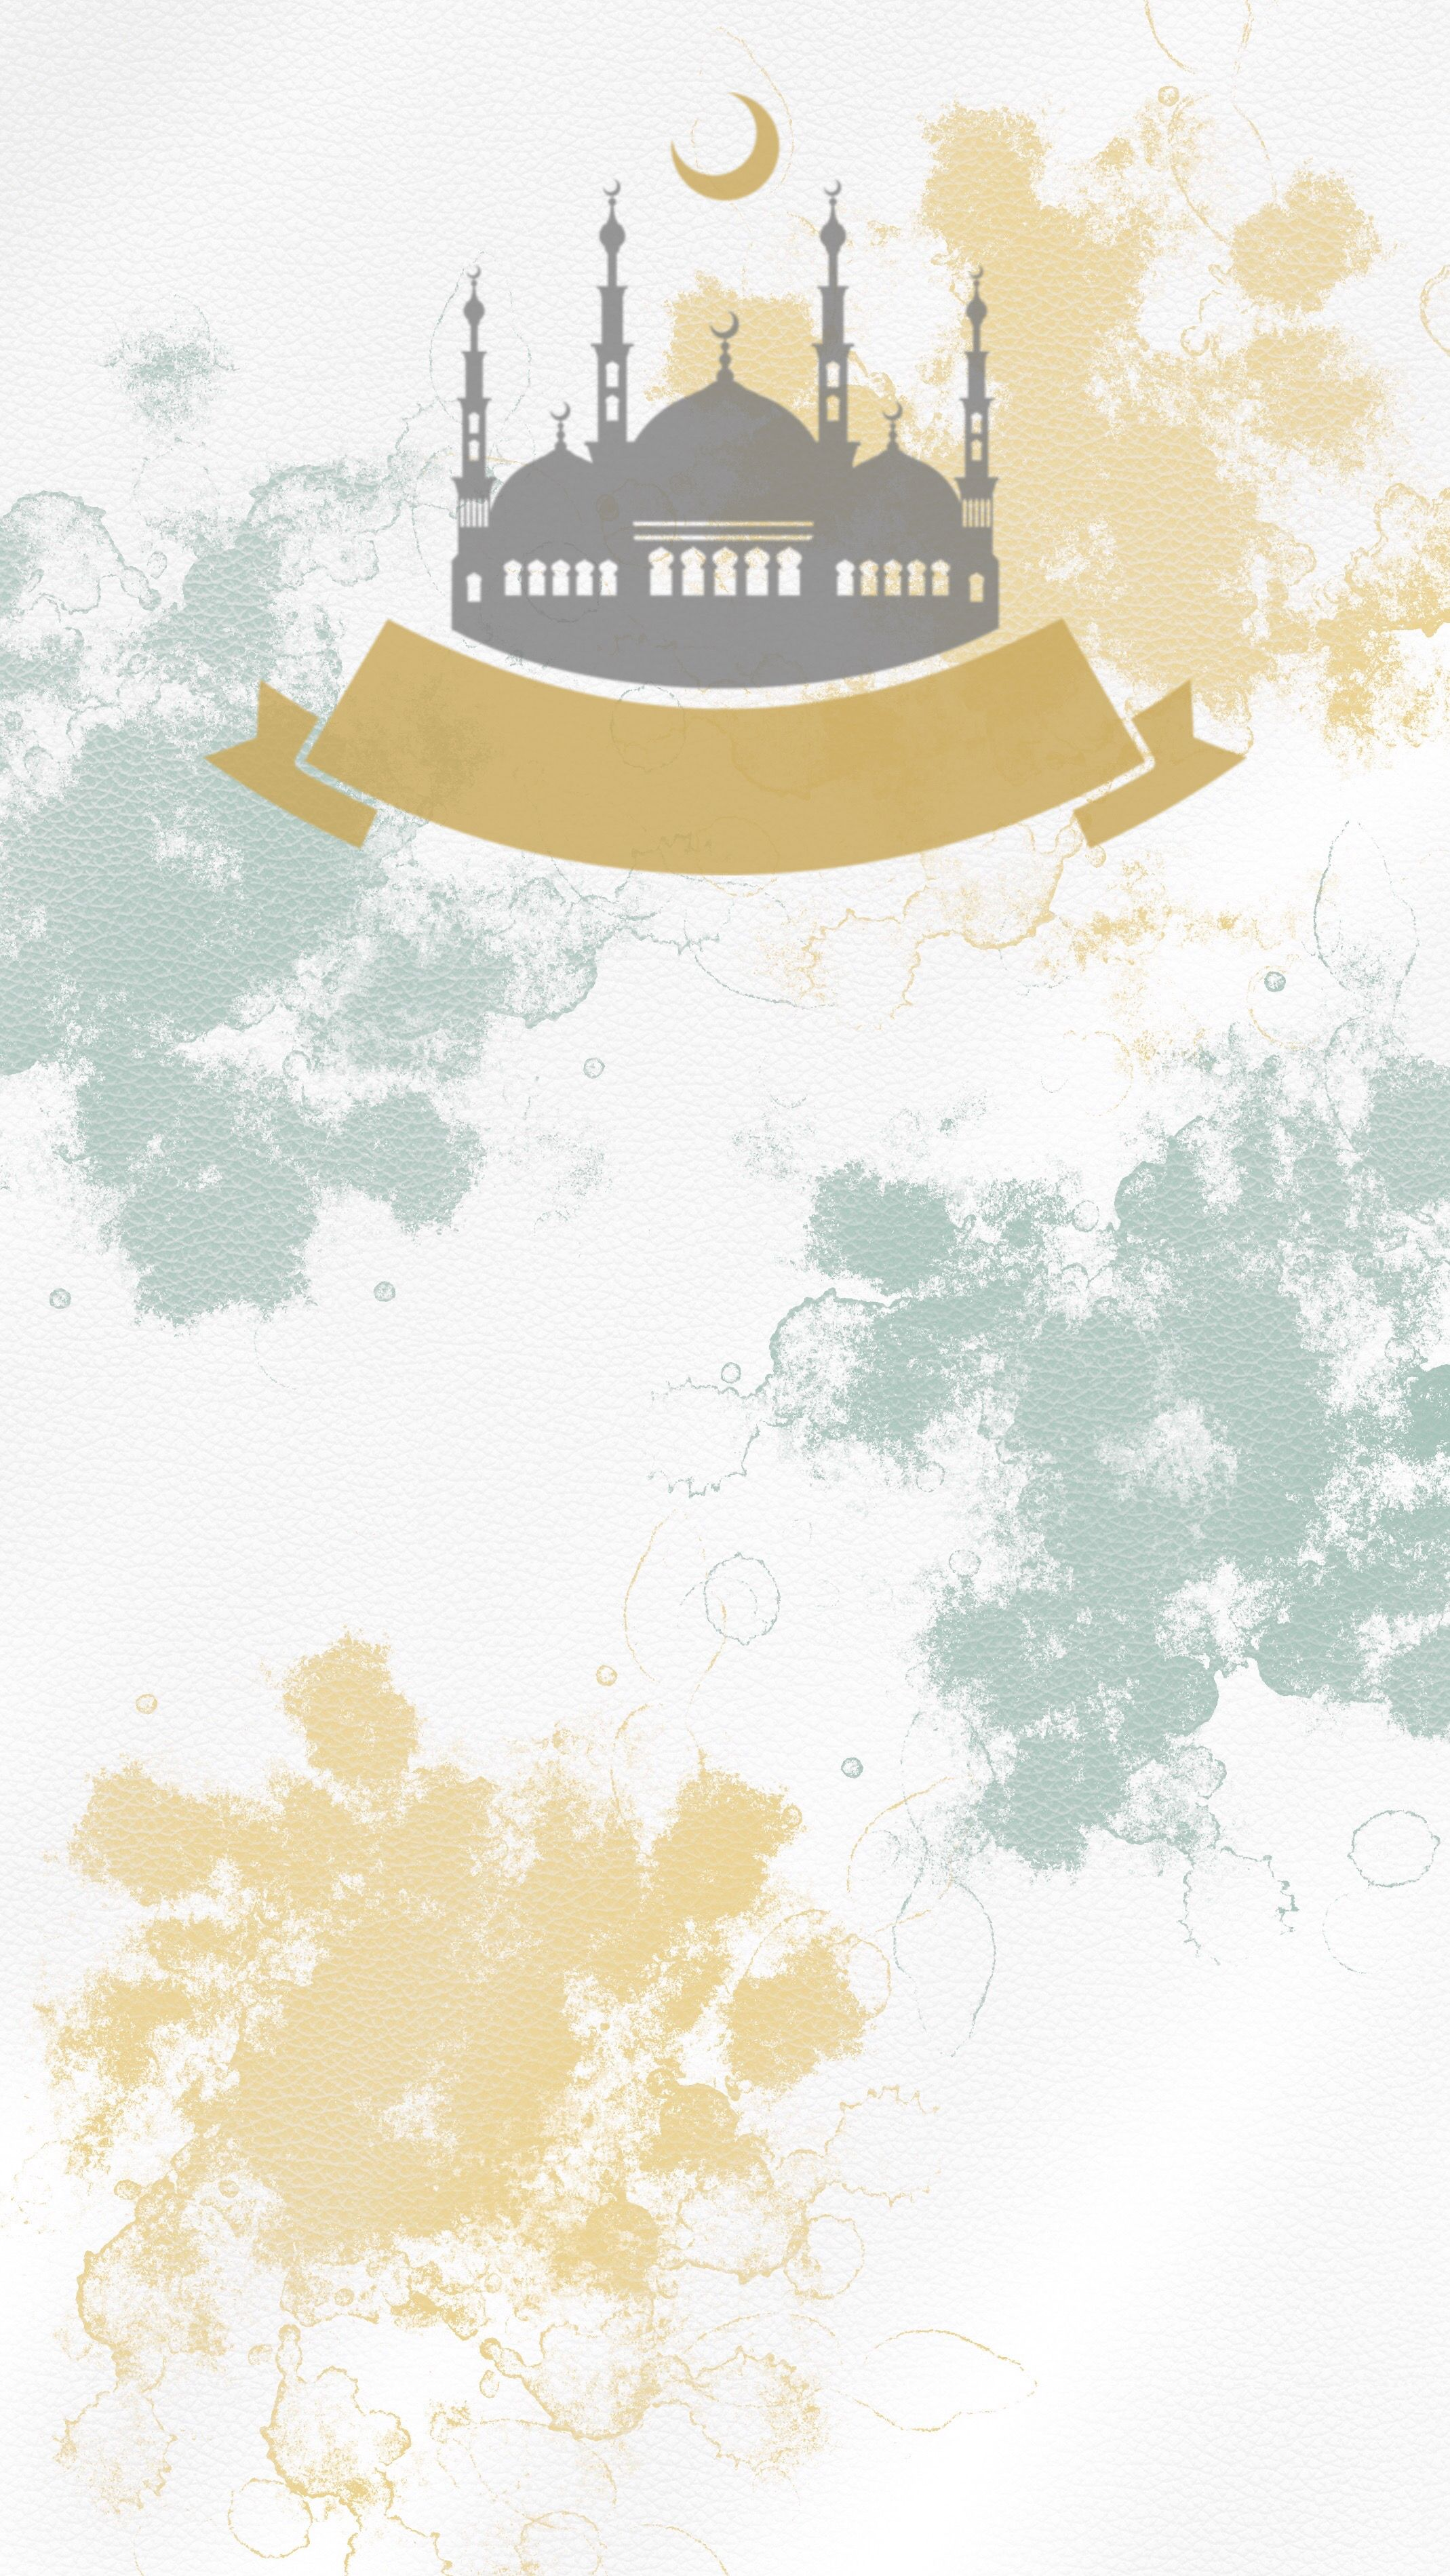 Kad Raya Design Templates Free To Download Creativitywindow Templates Eid Card Designs Greeting Card Template